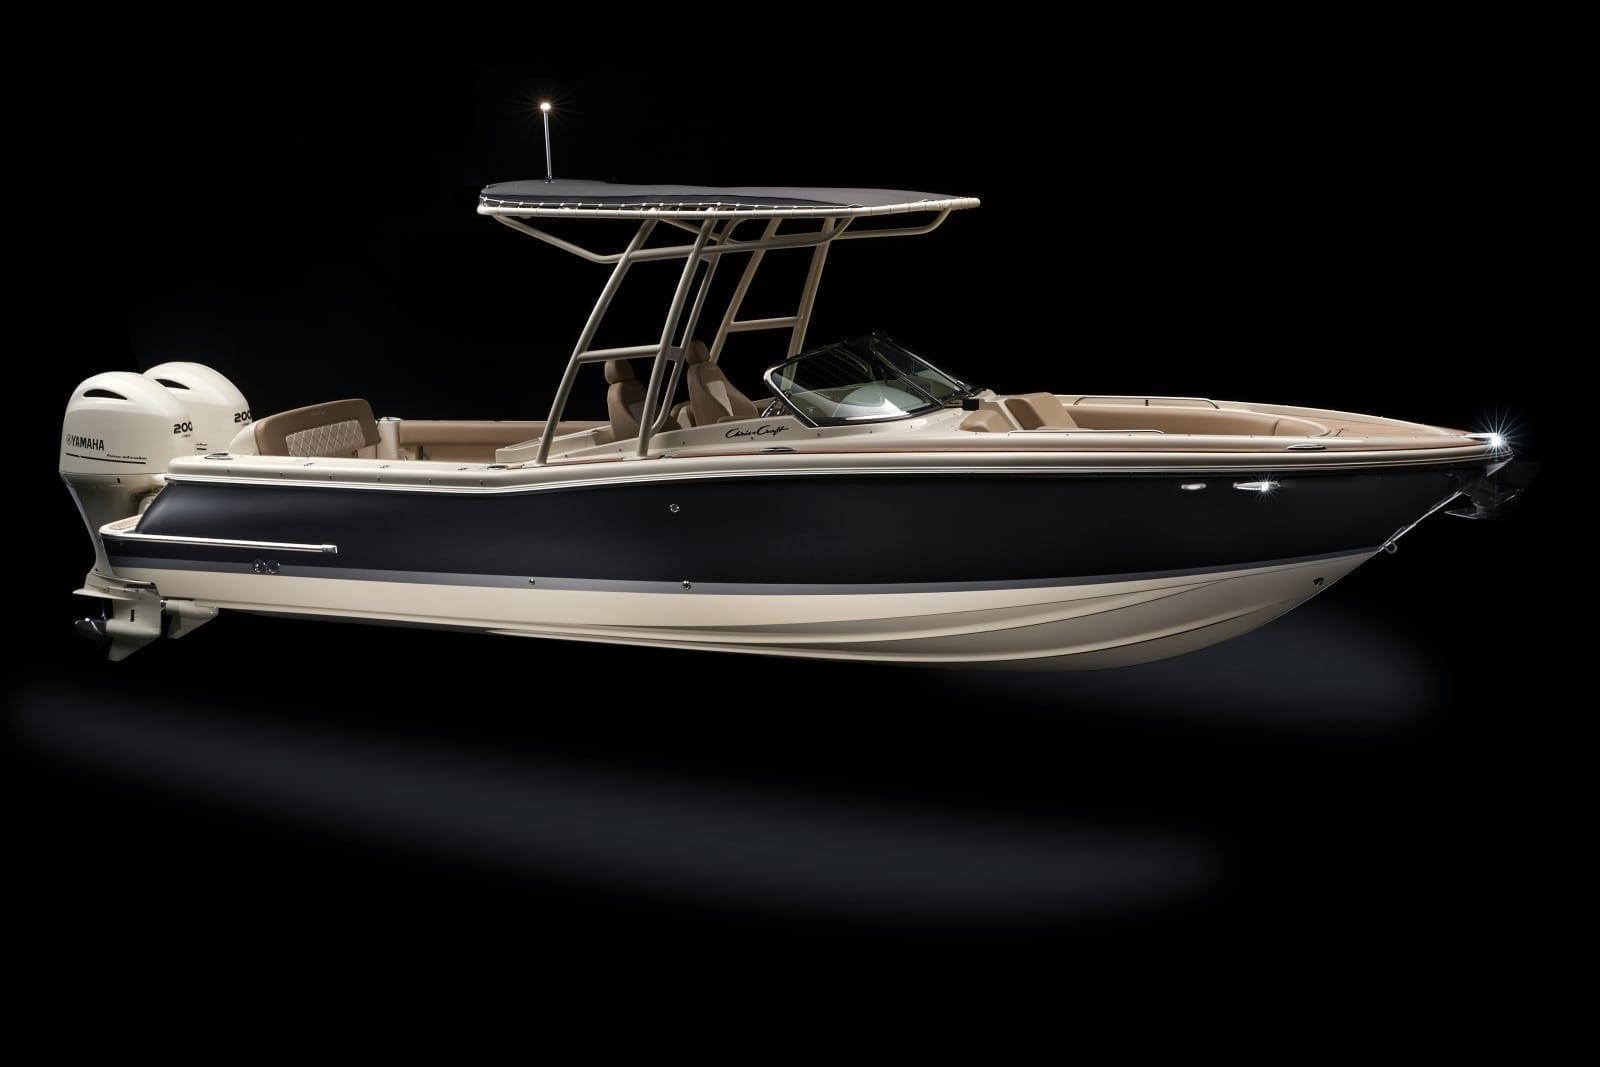 Chris Craft Calypso 26 Starboard Profile